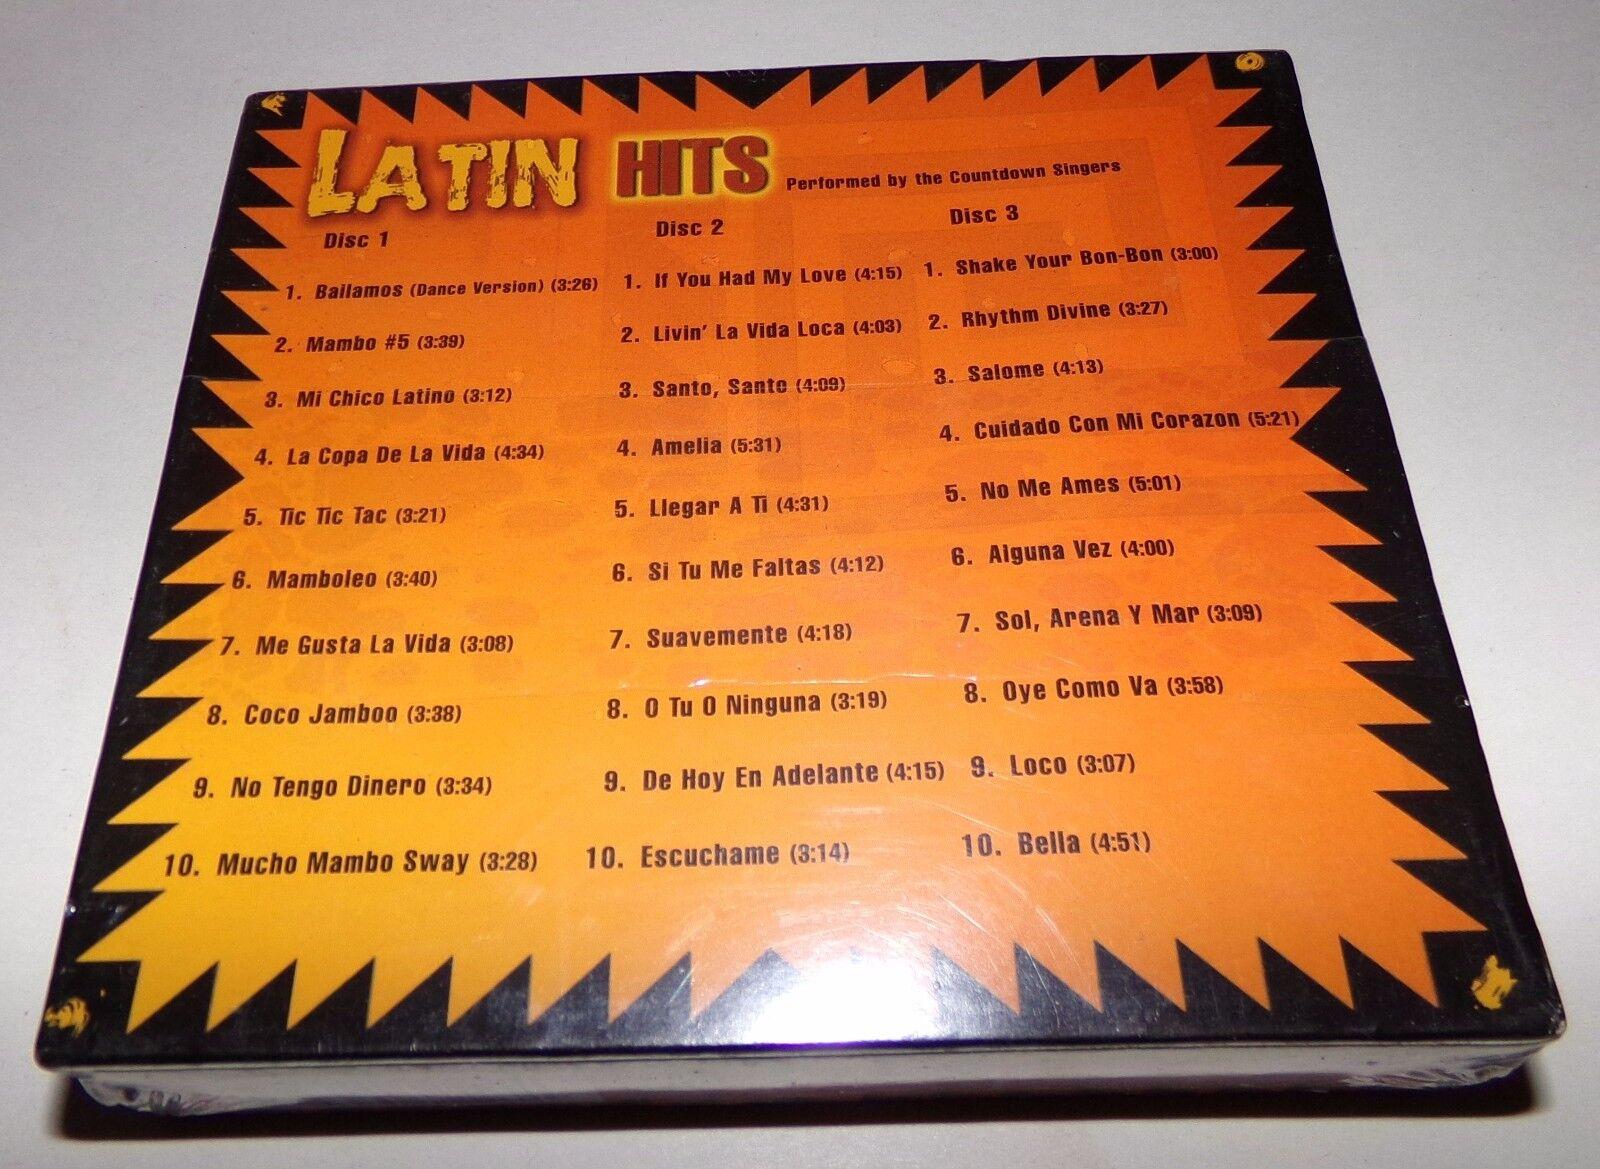 latin hits vols 1 2 3 box by the countdown singers cd 2000